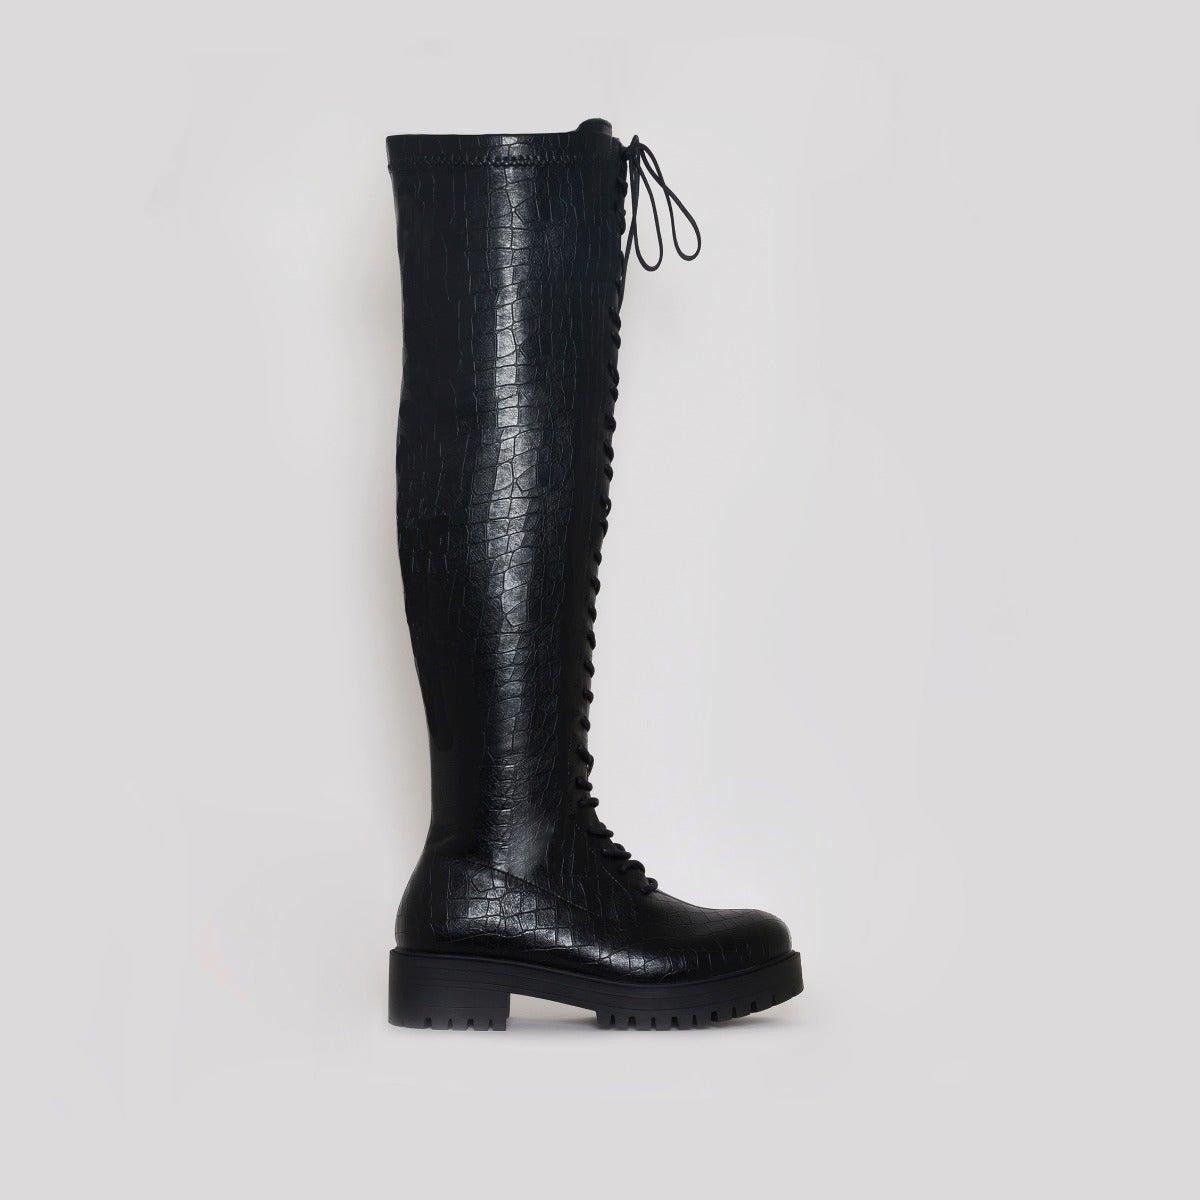 Manny Black Croc Print Flat Over Knee Boots